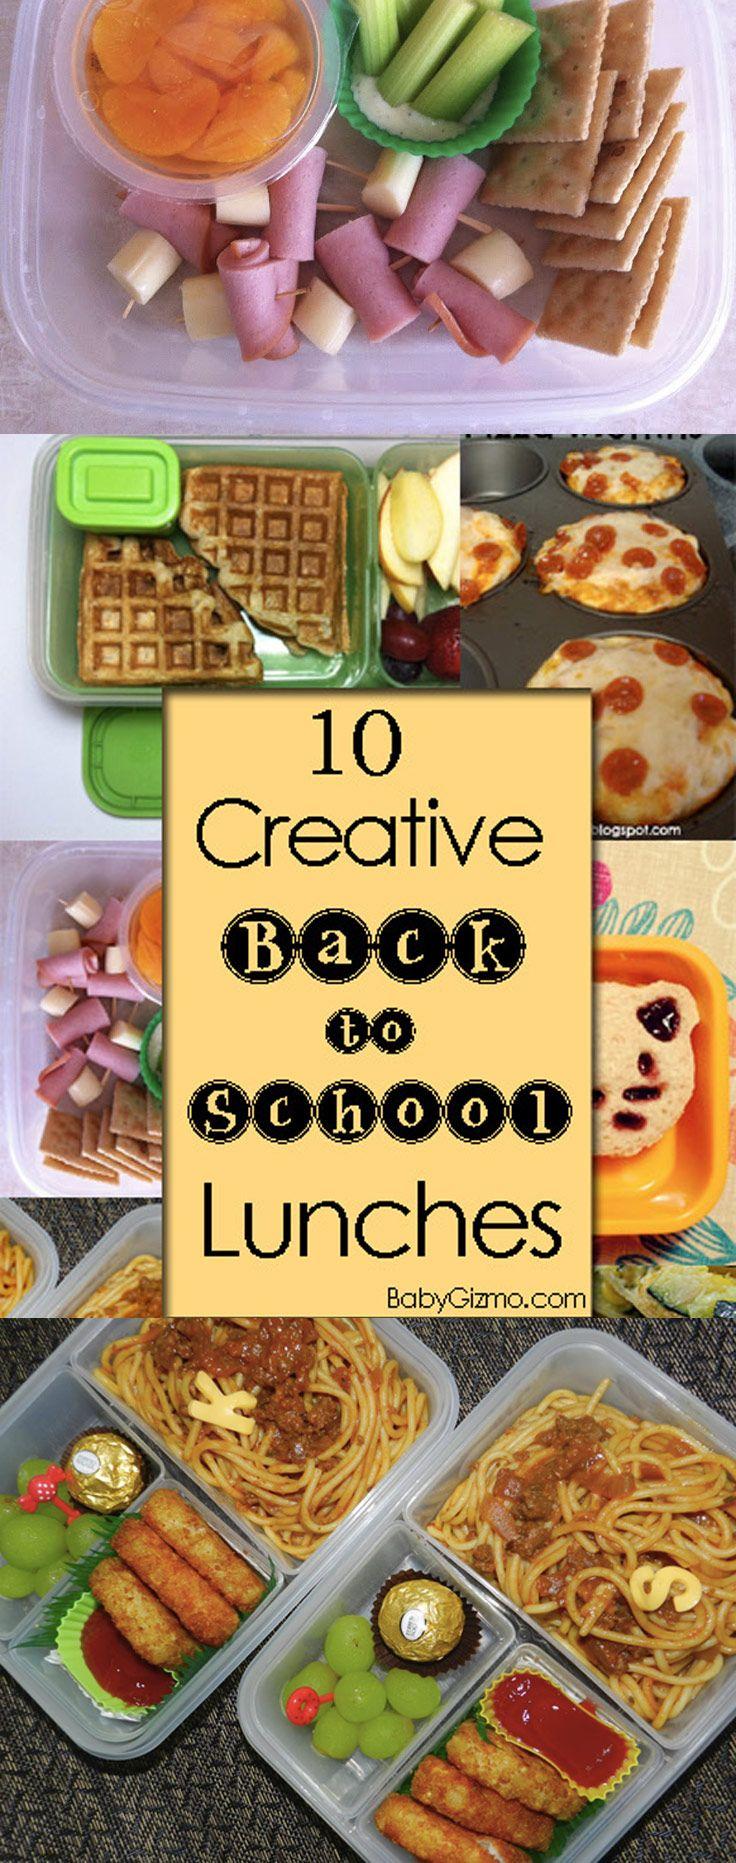 10 Creative Back to School Lunch Ideas! #bts #school #lunch #easy